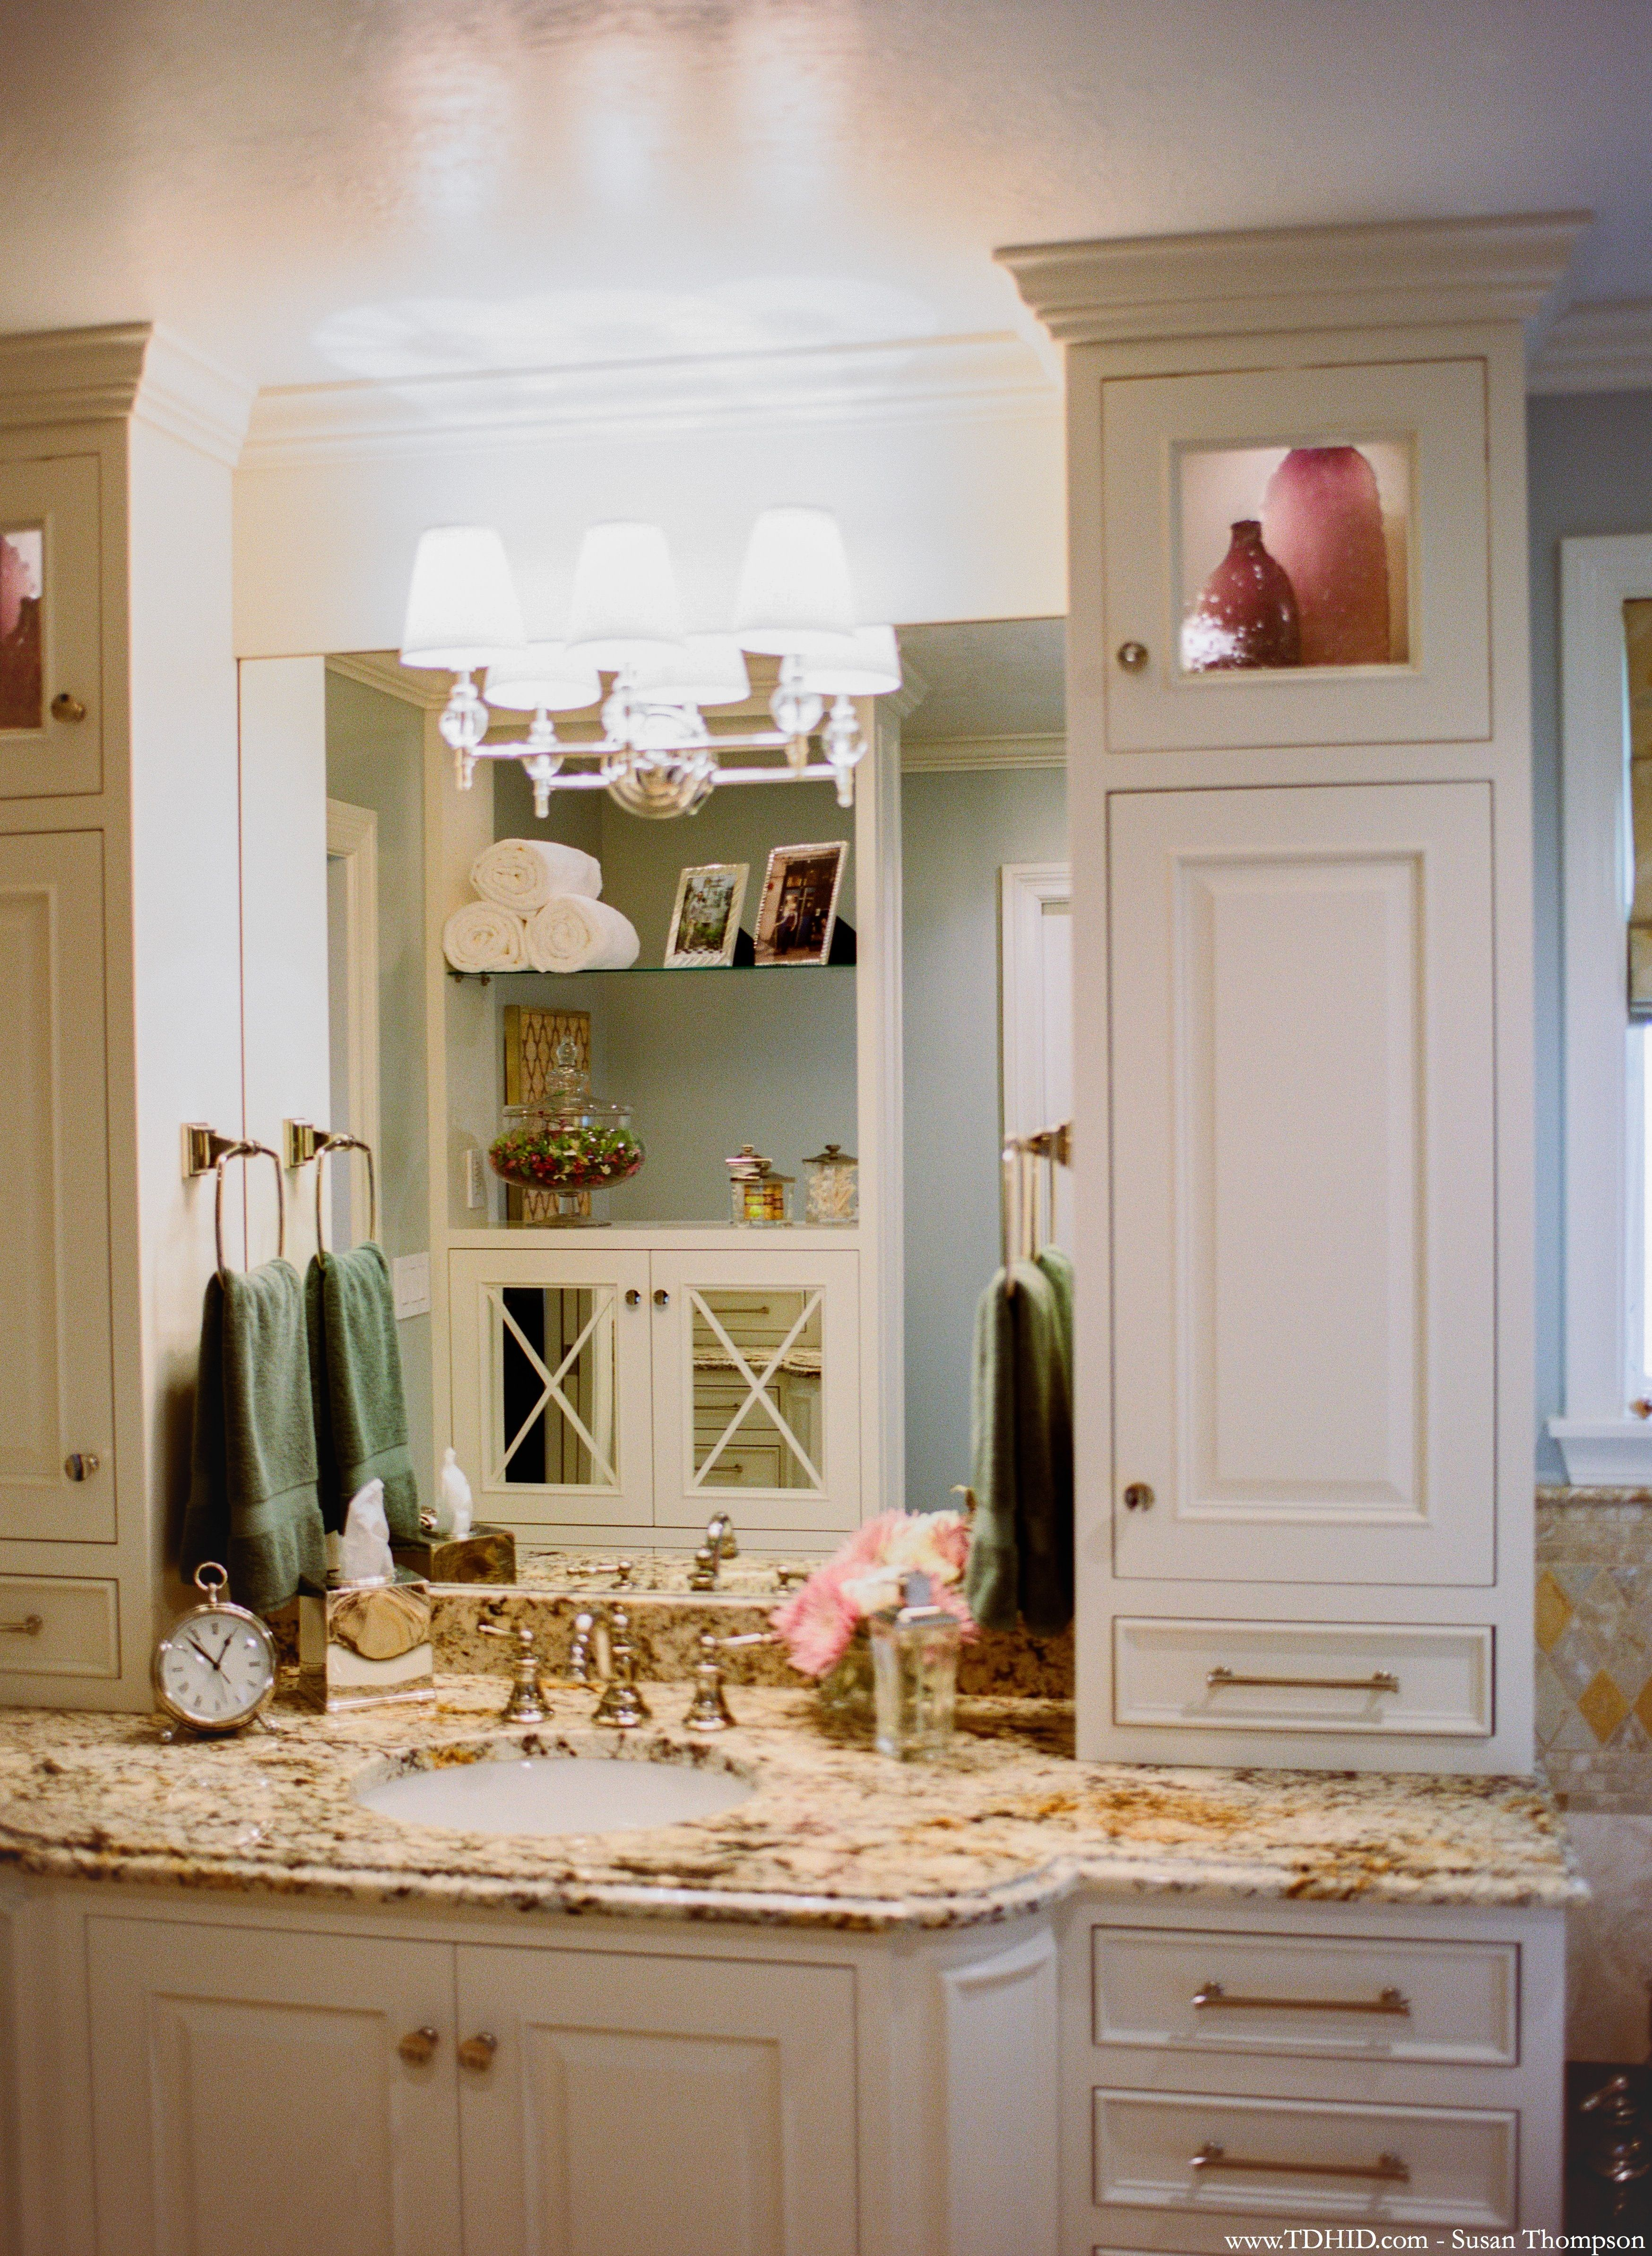 Canterwood bathroom design by the design house interior design